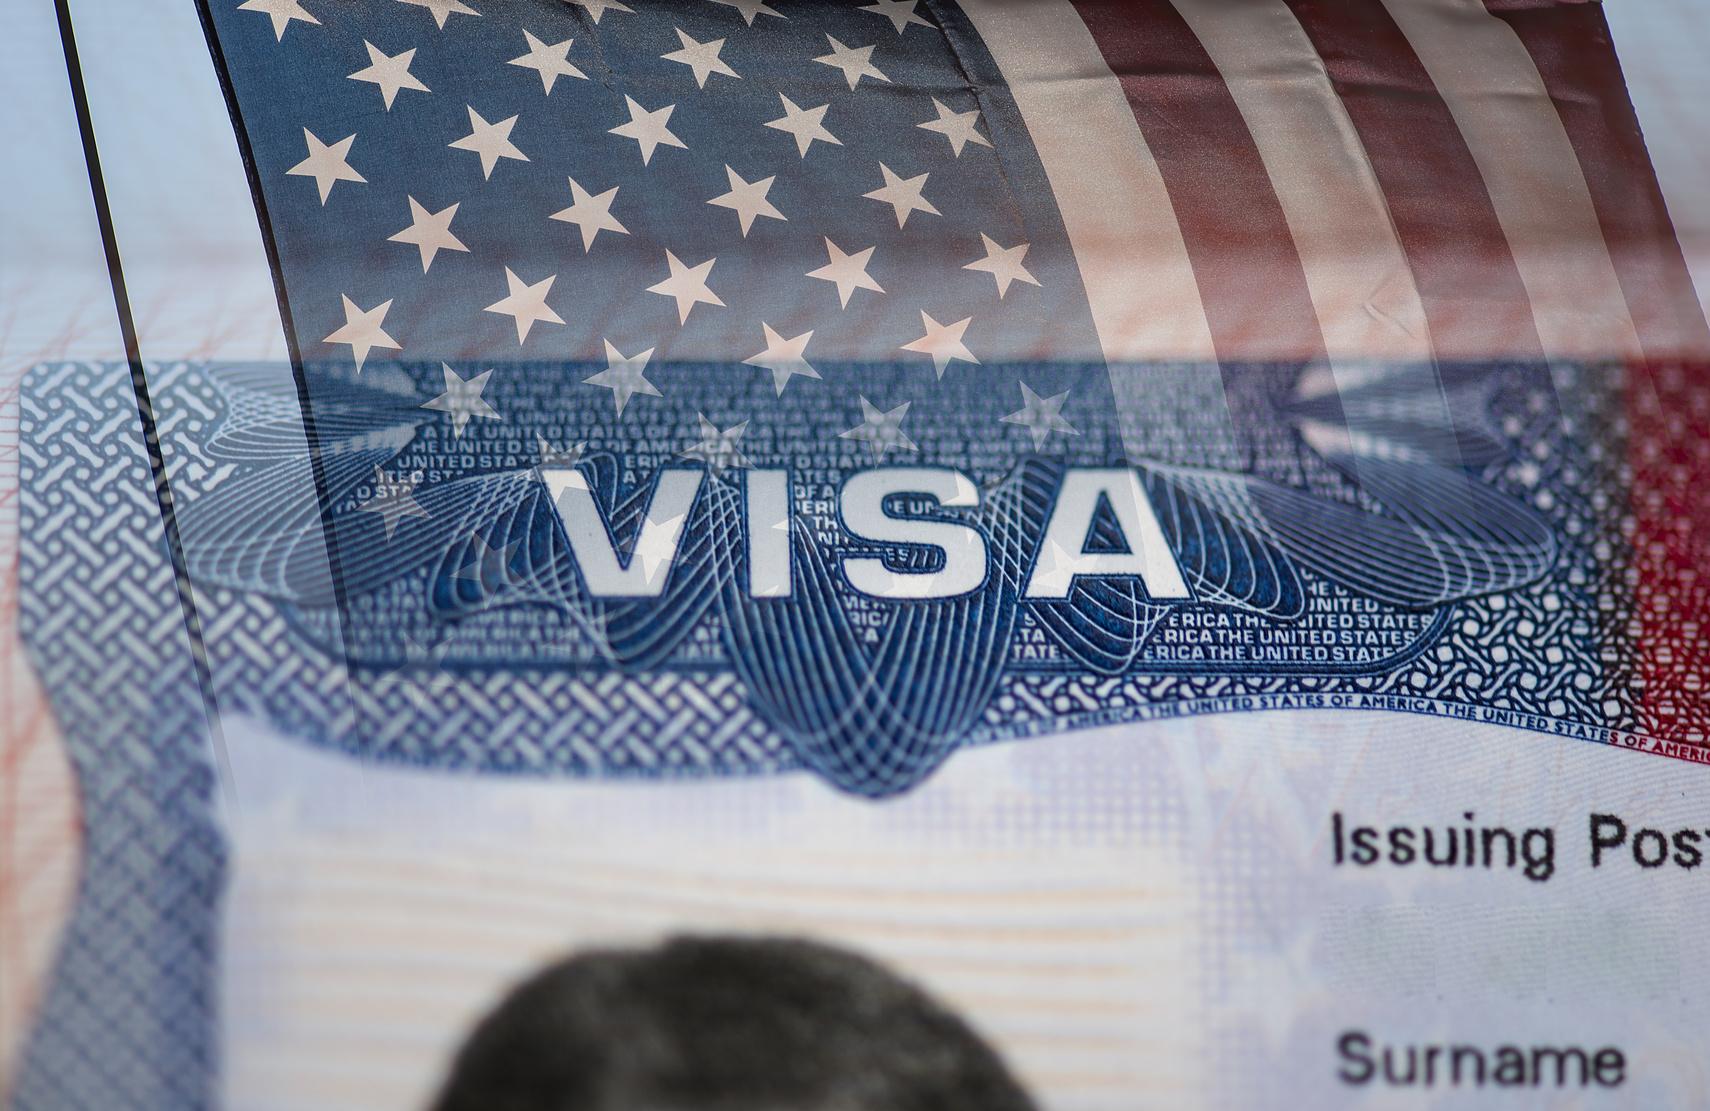 Chicago Immigration Law Firm | Minsky, McCormick & Hallagan